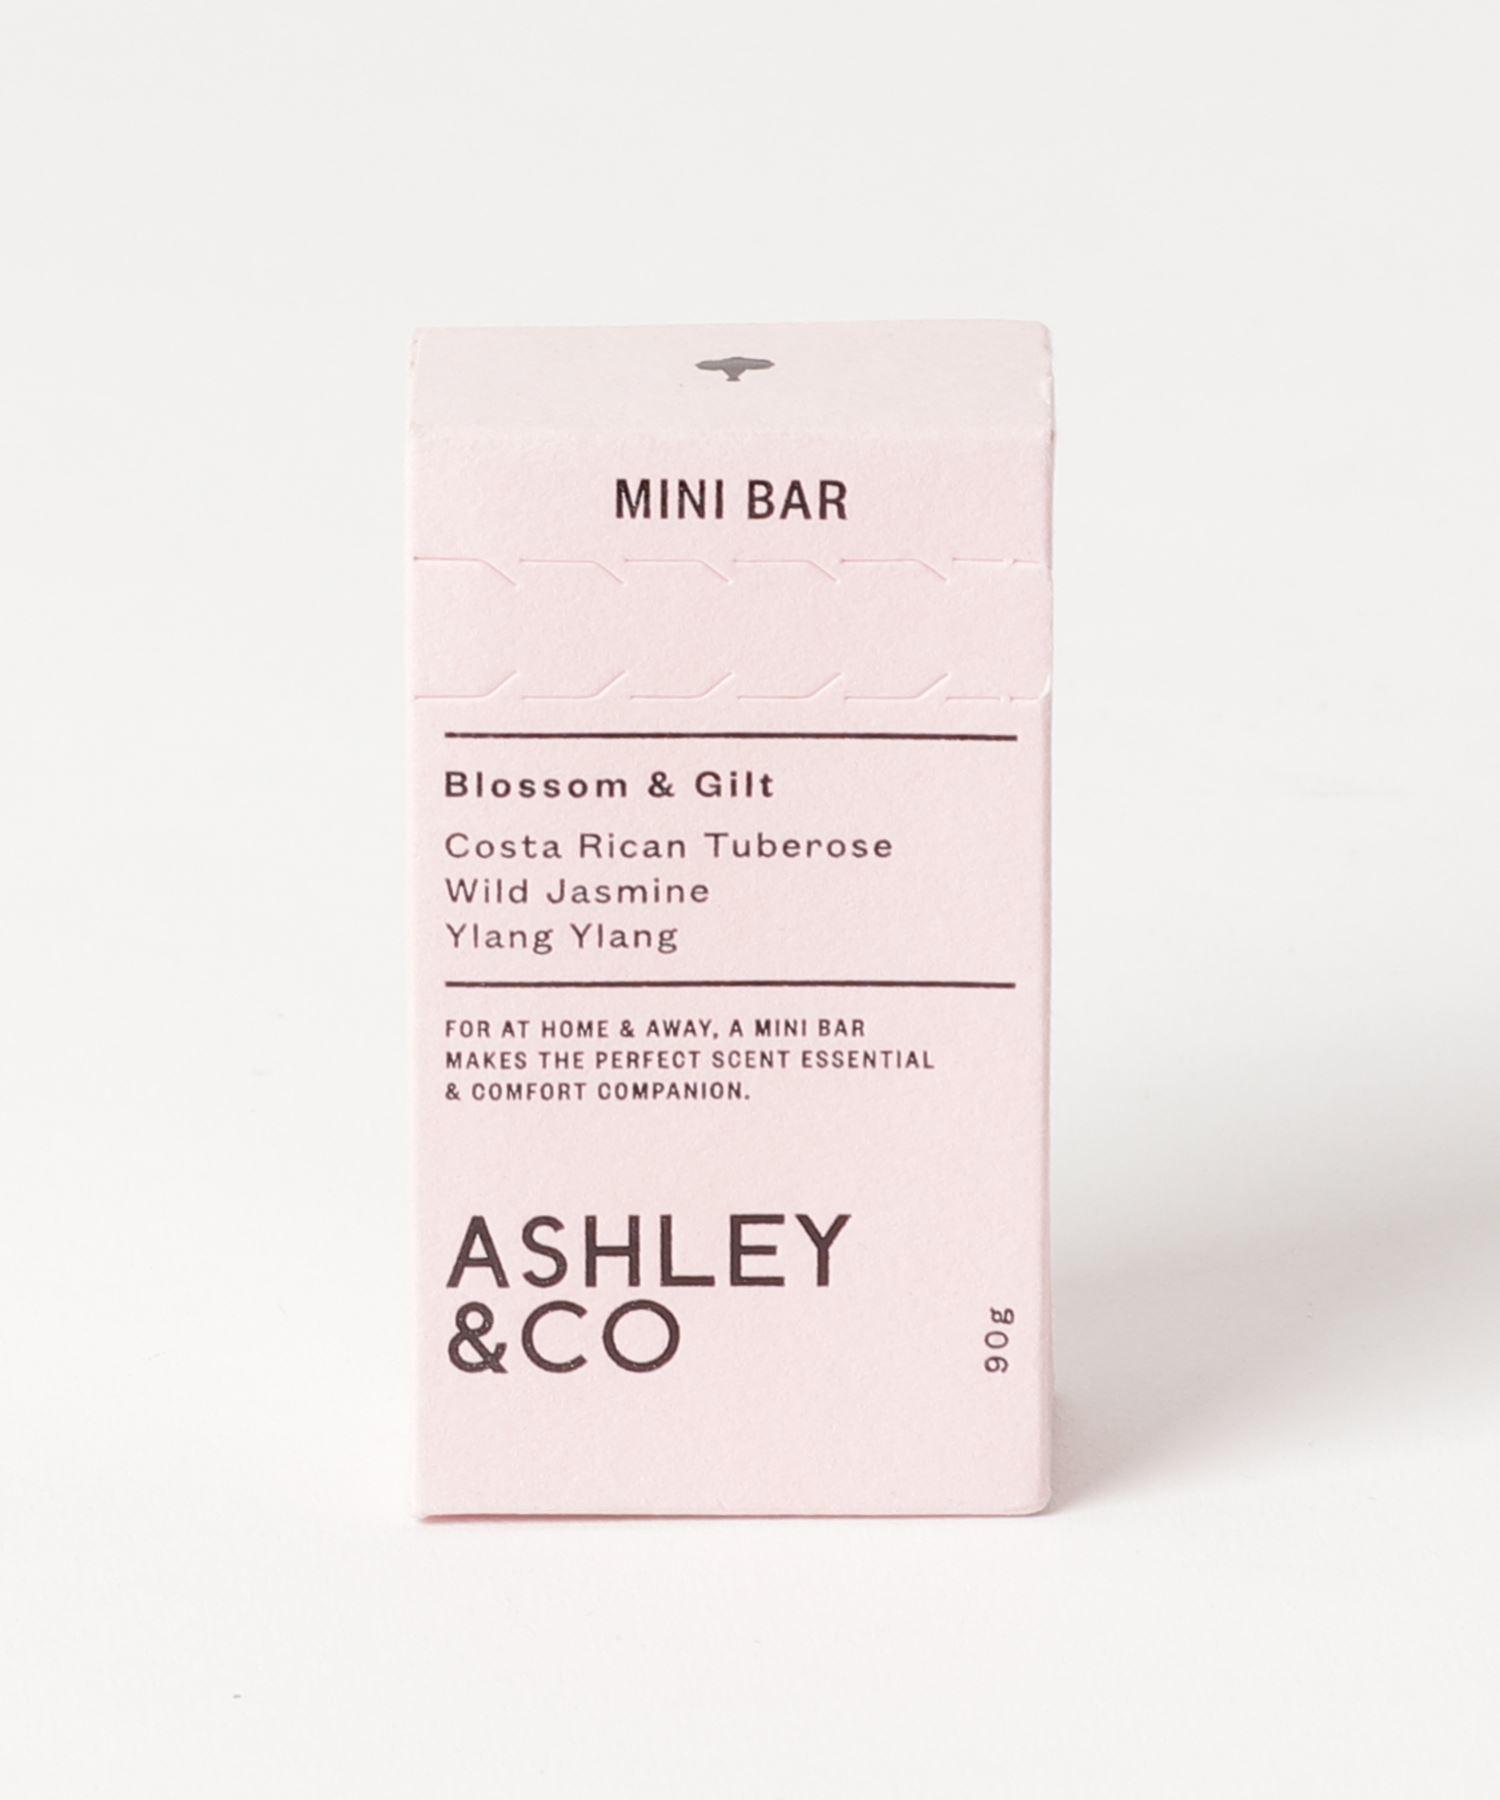 ASHLEY & CO ソープ Blossom & Gilt 90g